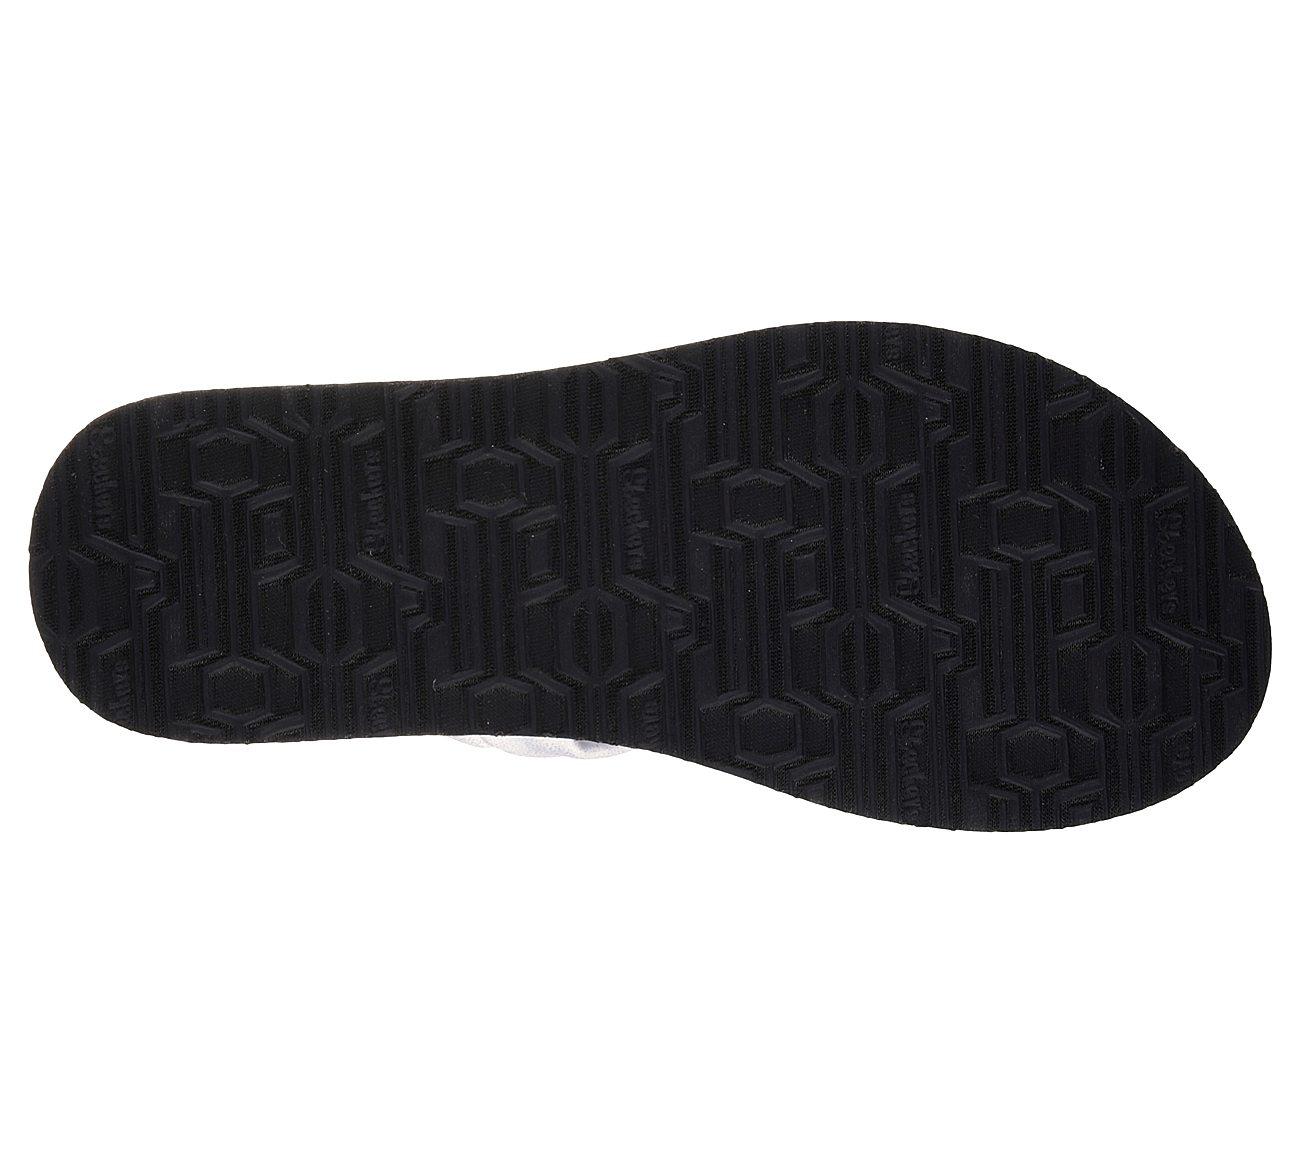 f2fbcffda0f5 Buy SKECHERS Meditation - Disco SKECHERS Cali Shoes only £29.00